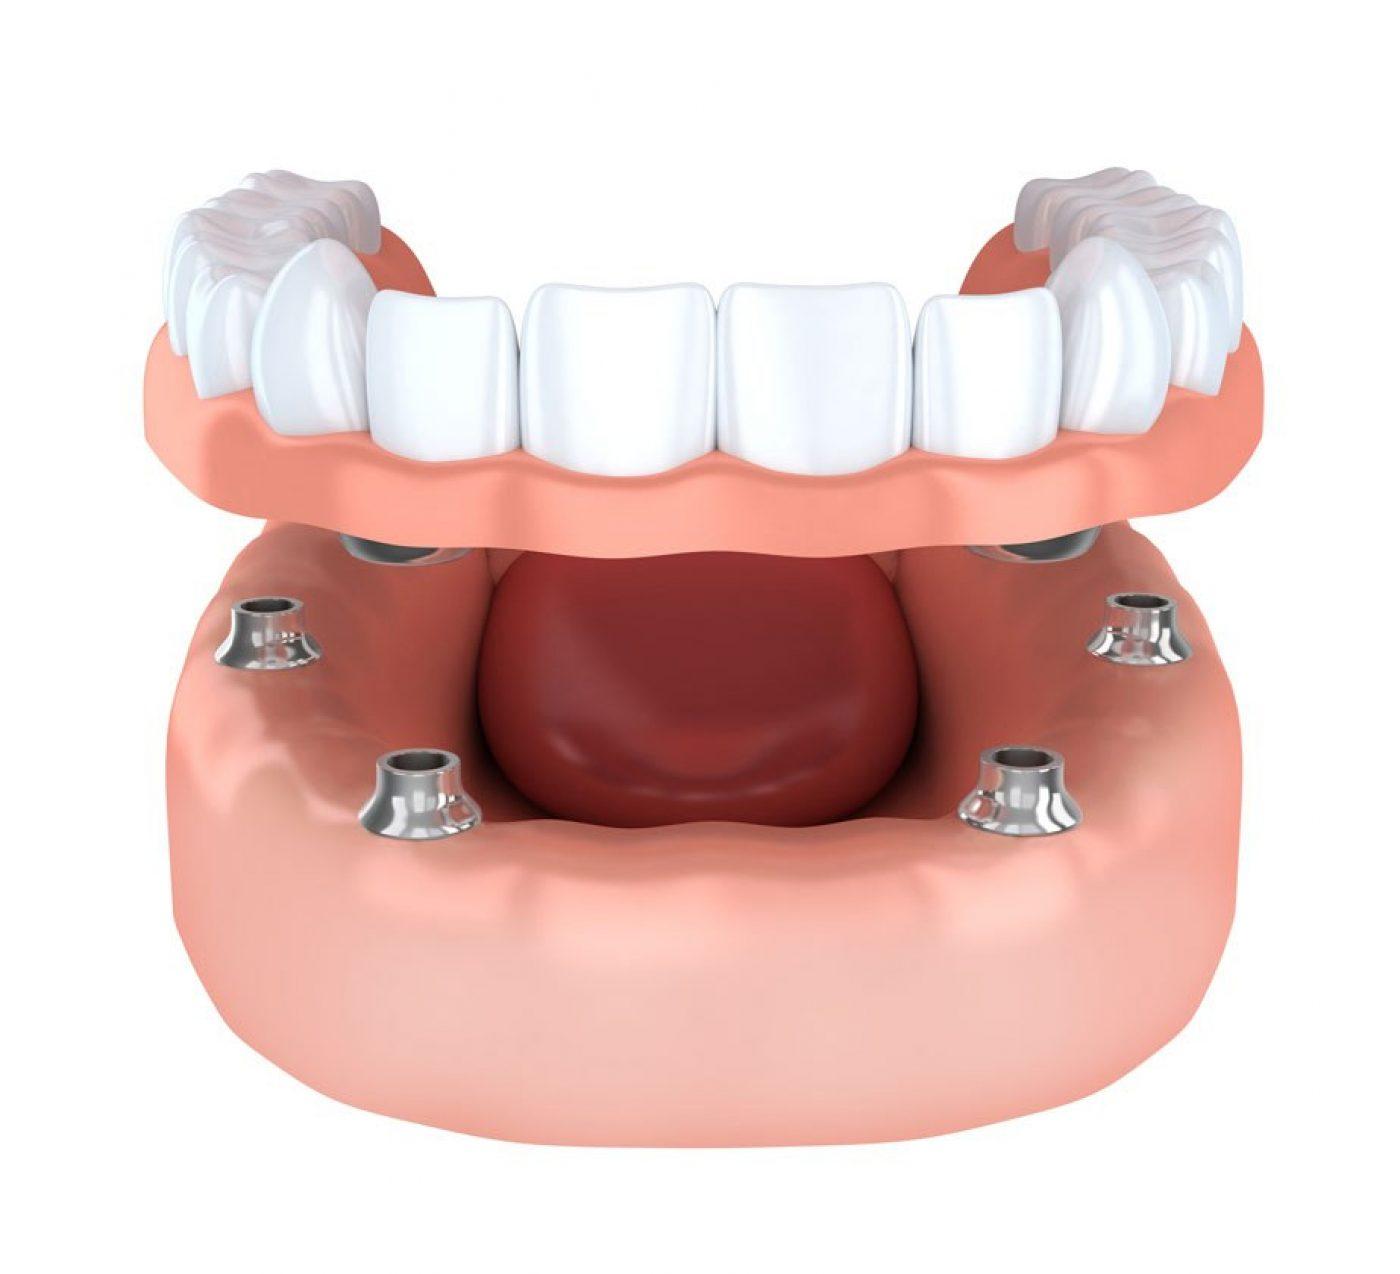 Hdic Dental Implants Sameday